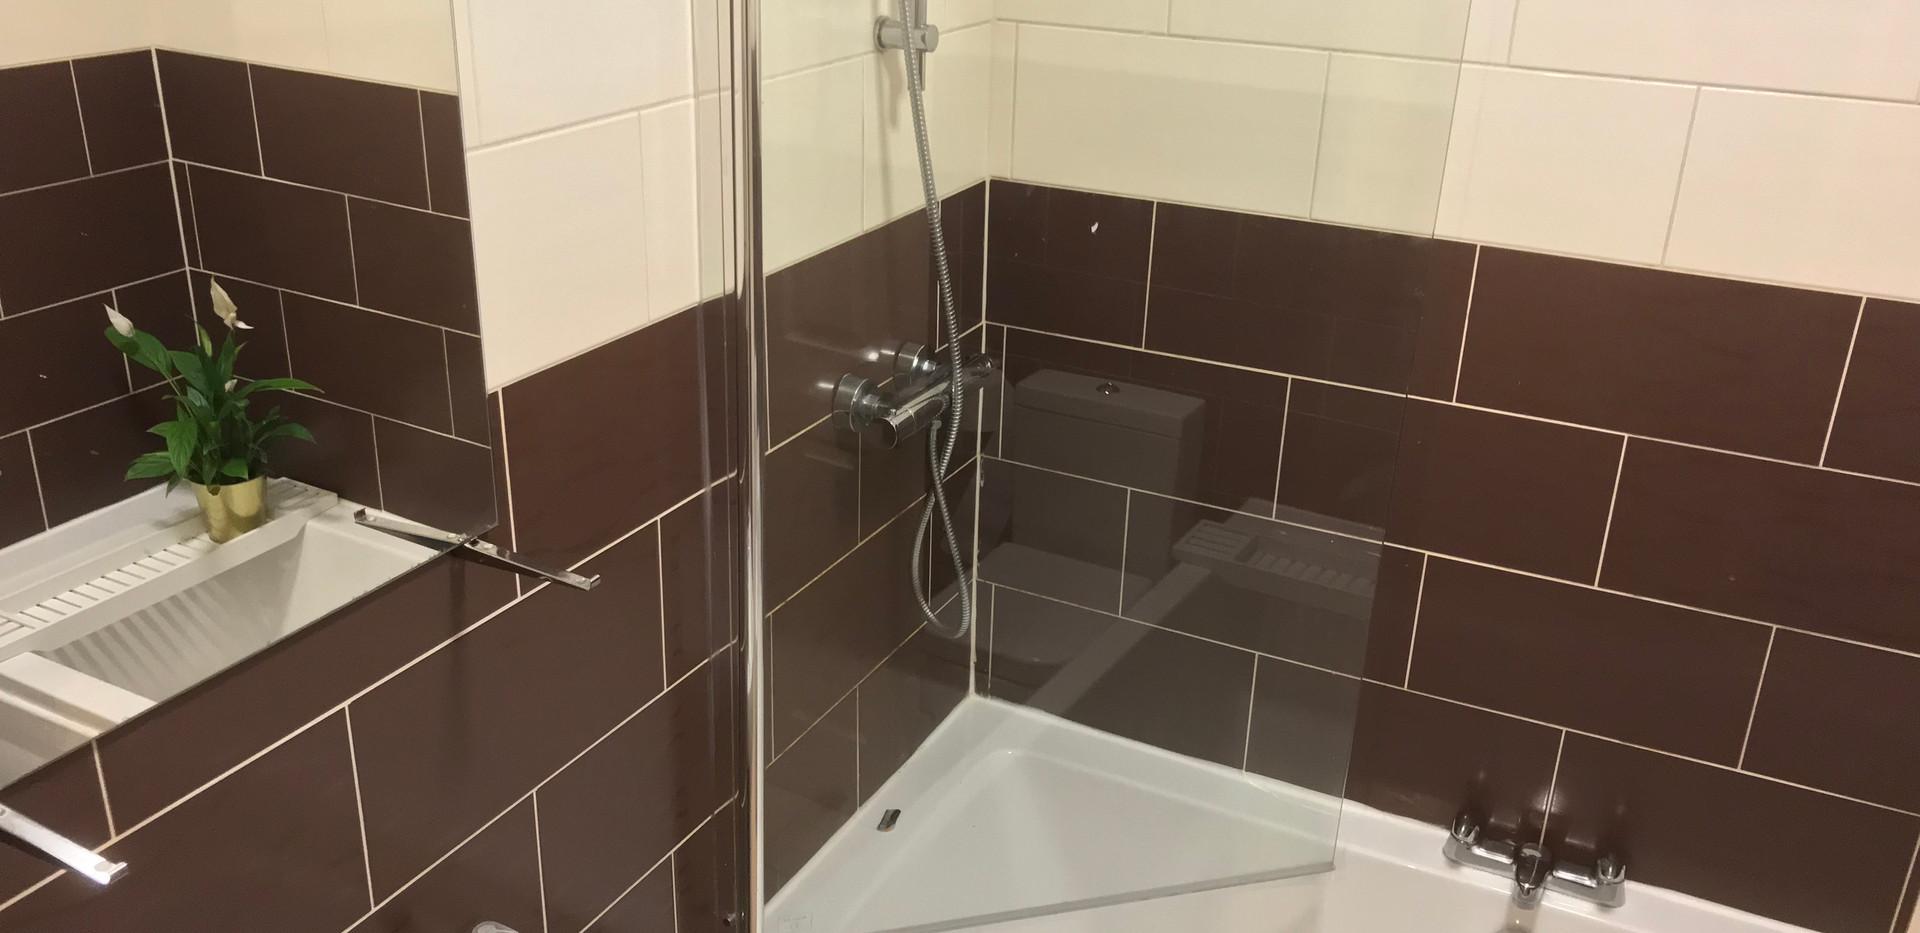 SH Cardigan Bathroom 1.jpg